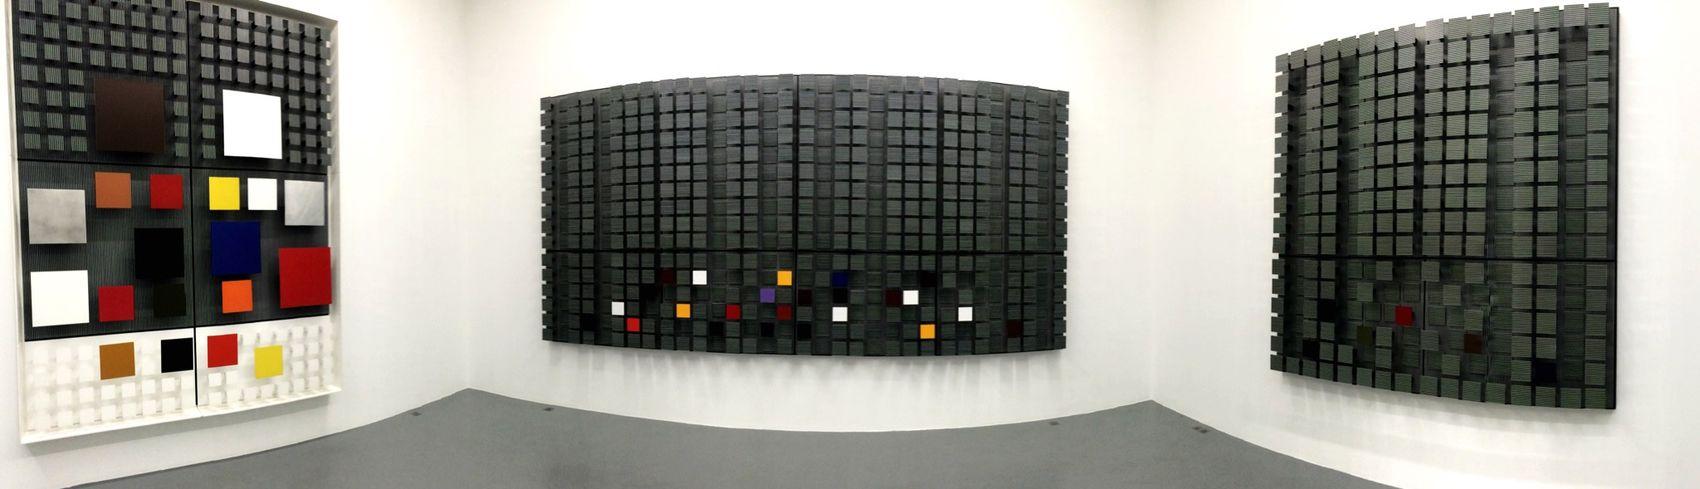 Jesus Rafael  Soto - Artist Exhibition Perrotingallerie Galerie - Paris Hanging Out Boyfriend